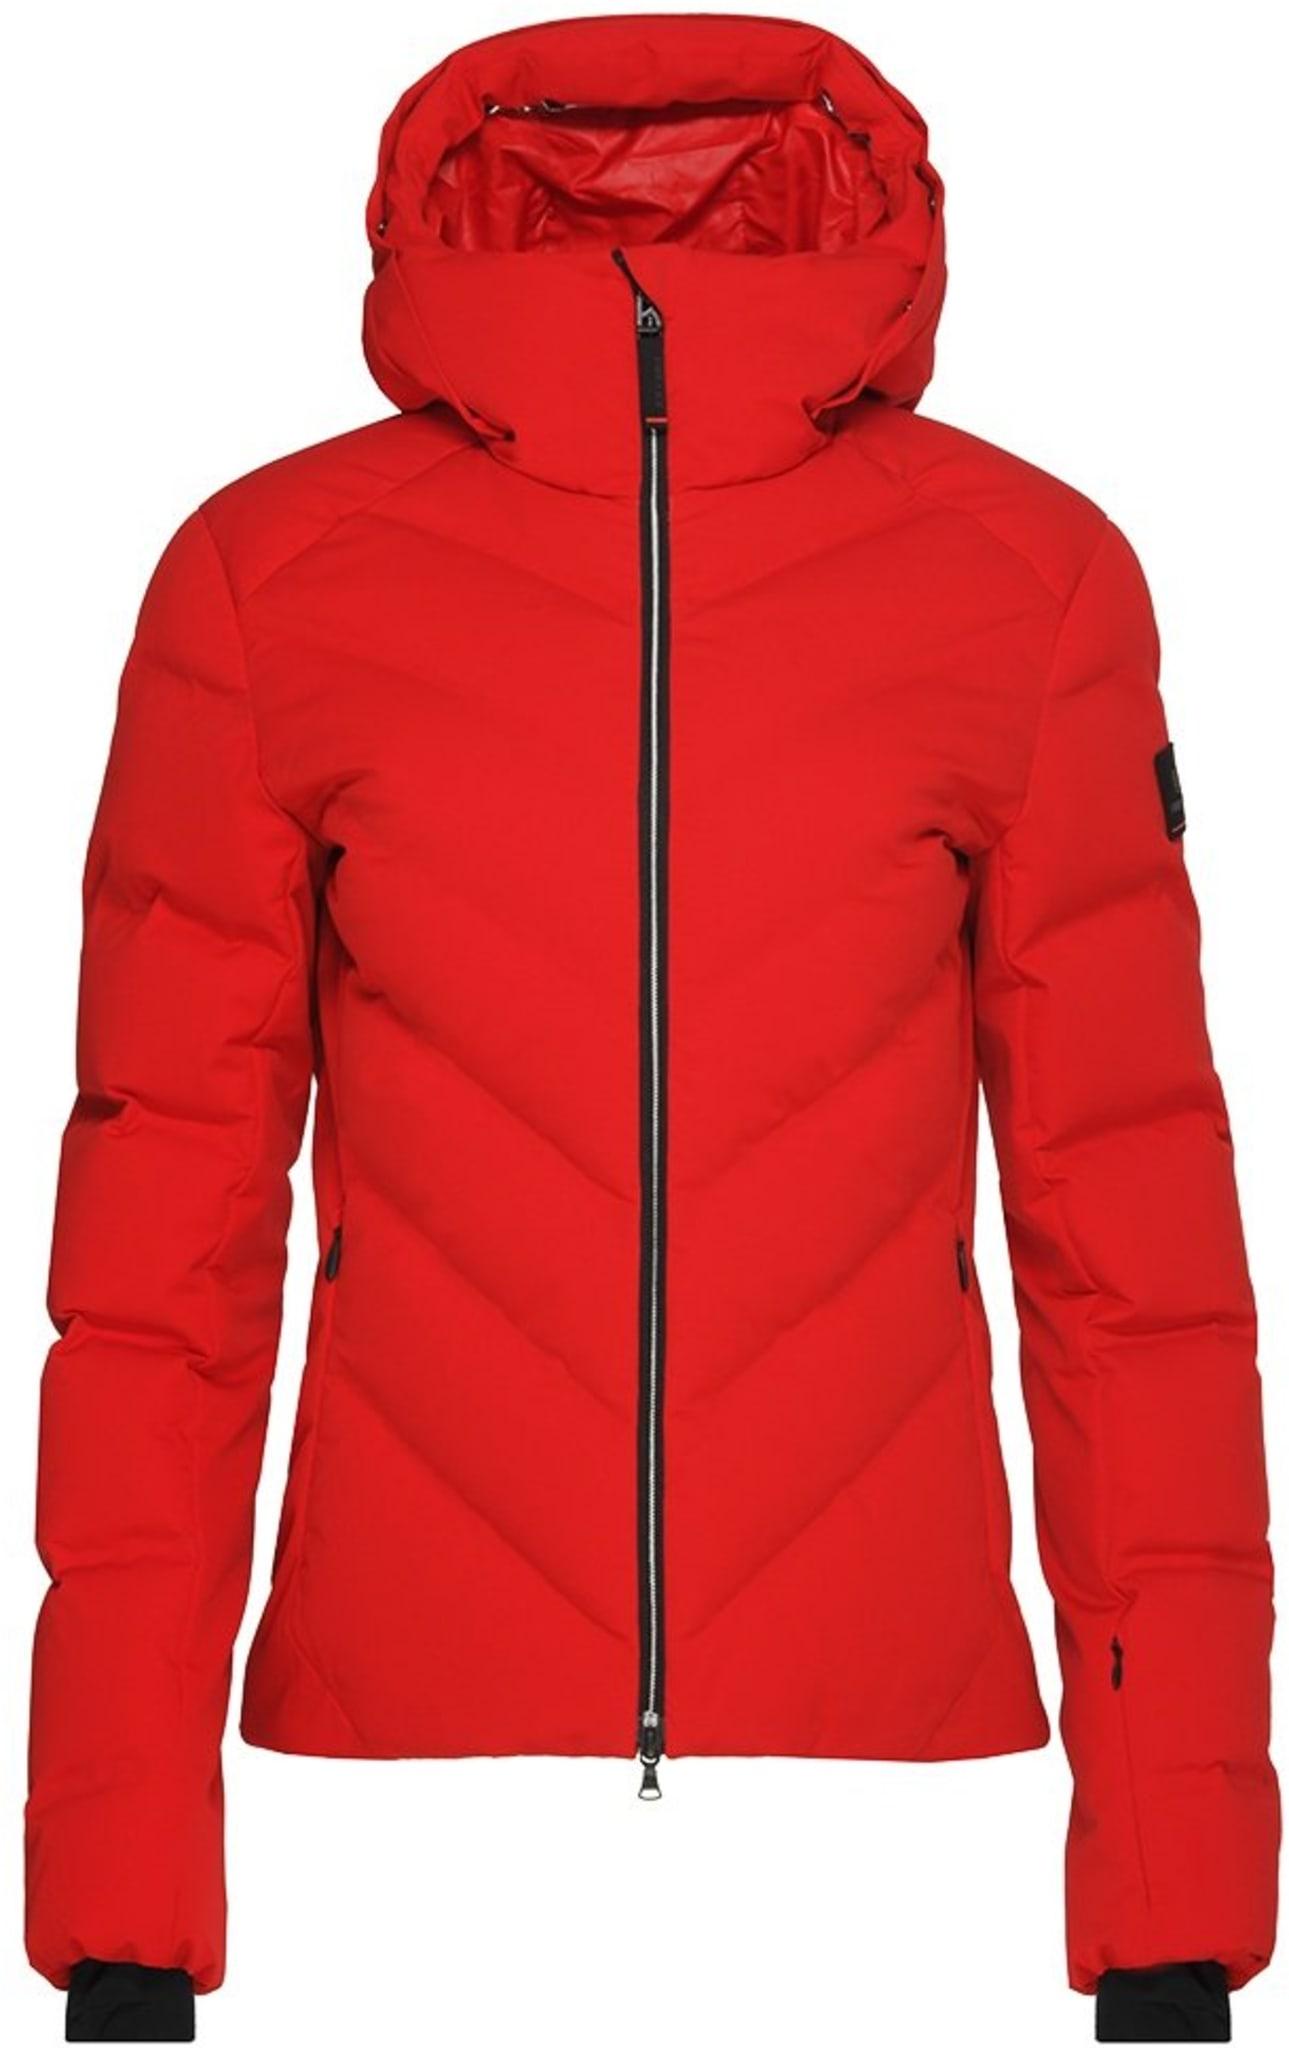 Carla Insulated Ski Jacket